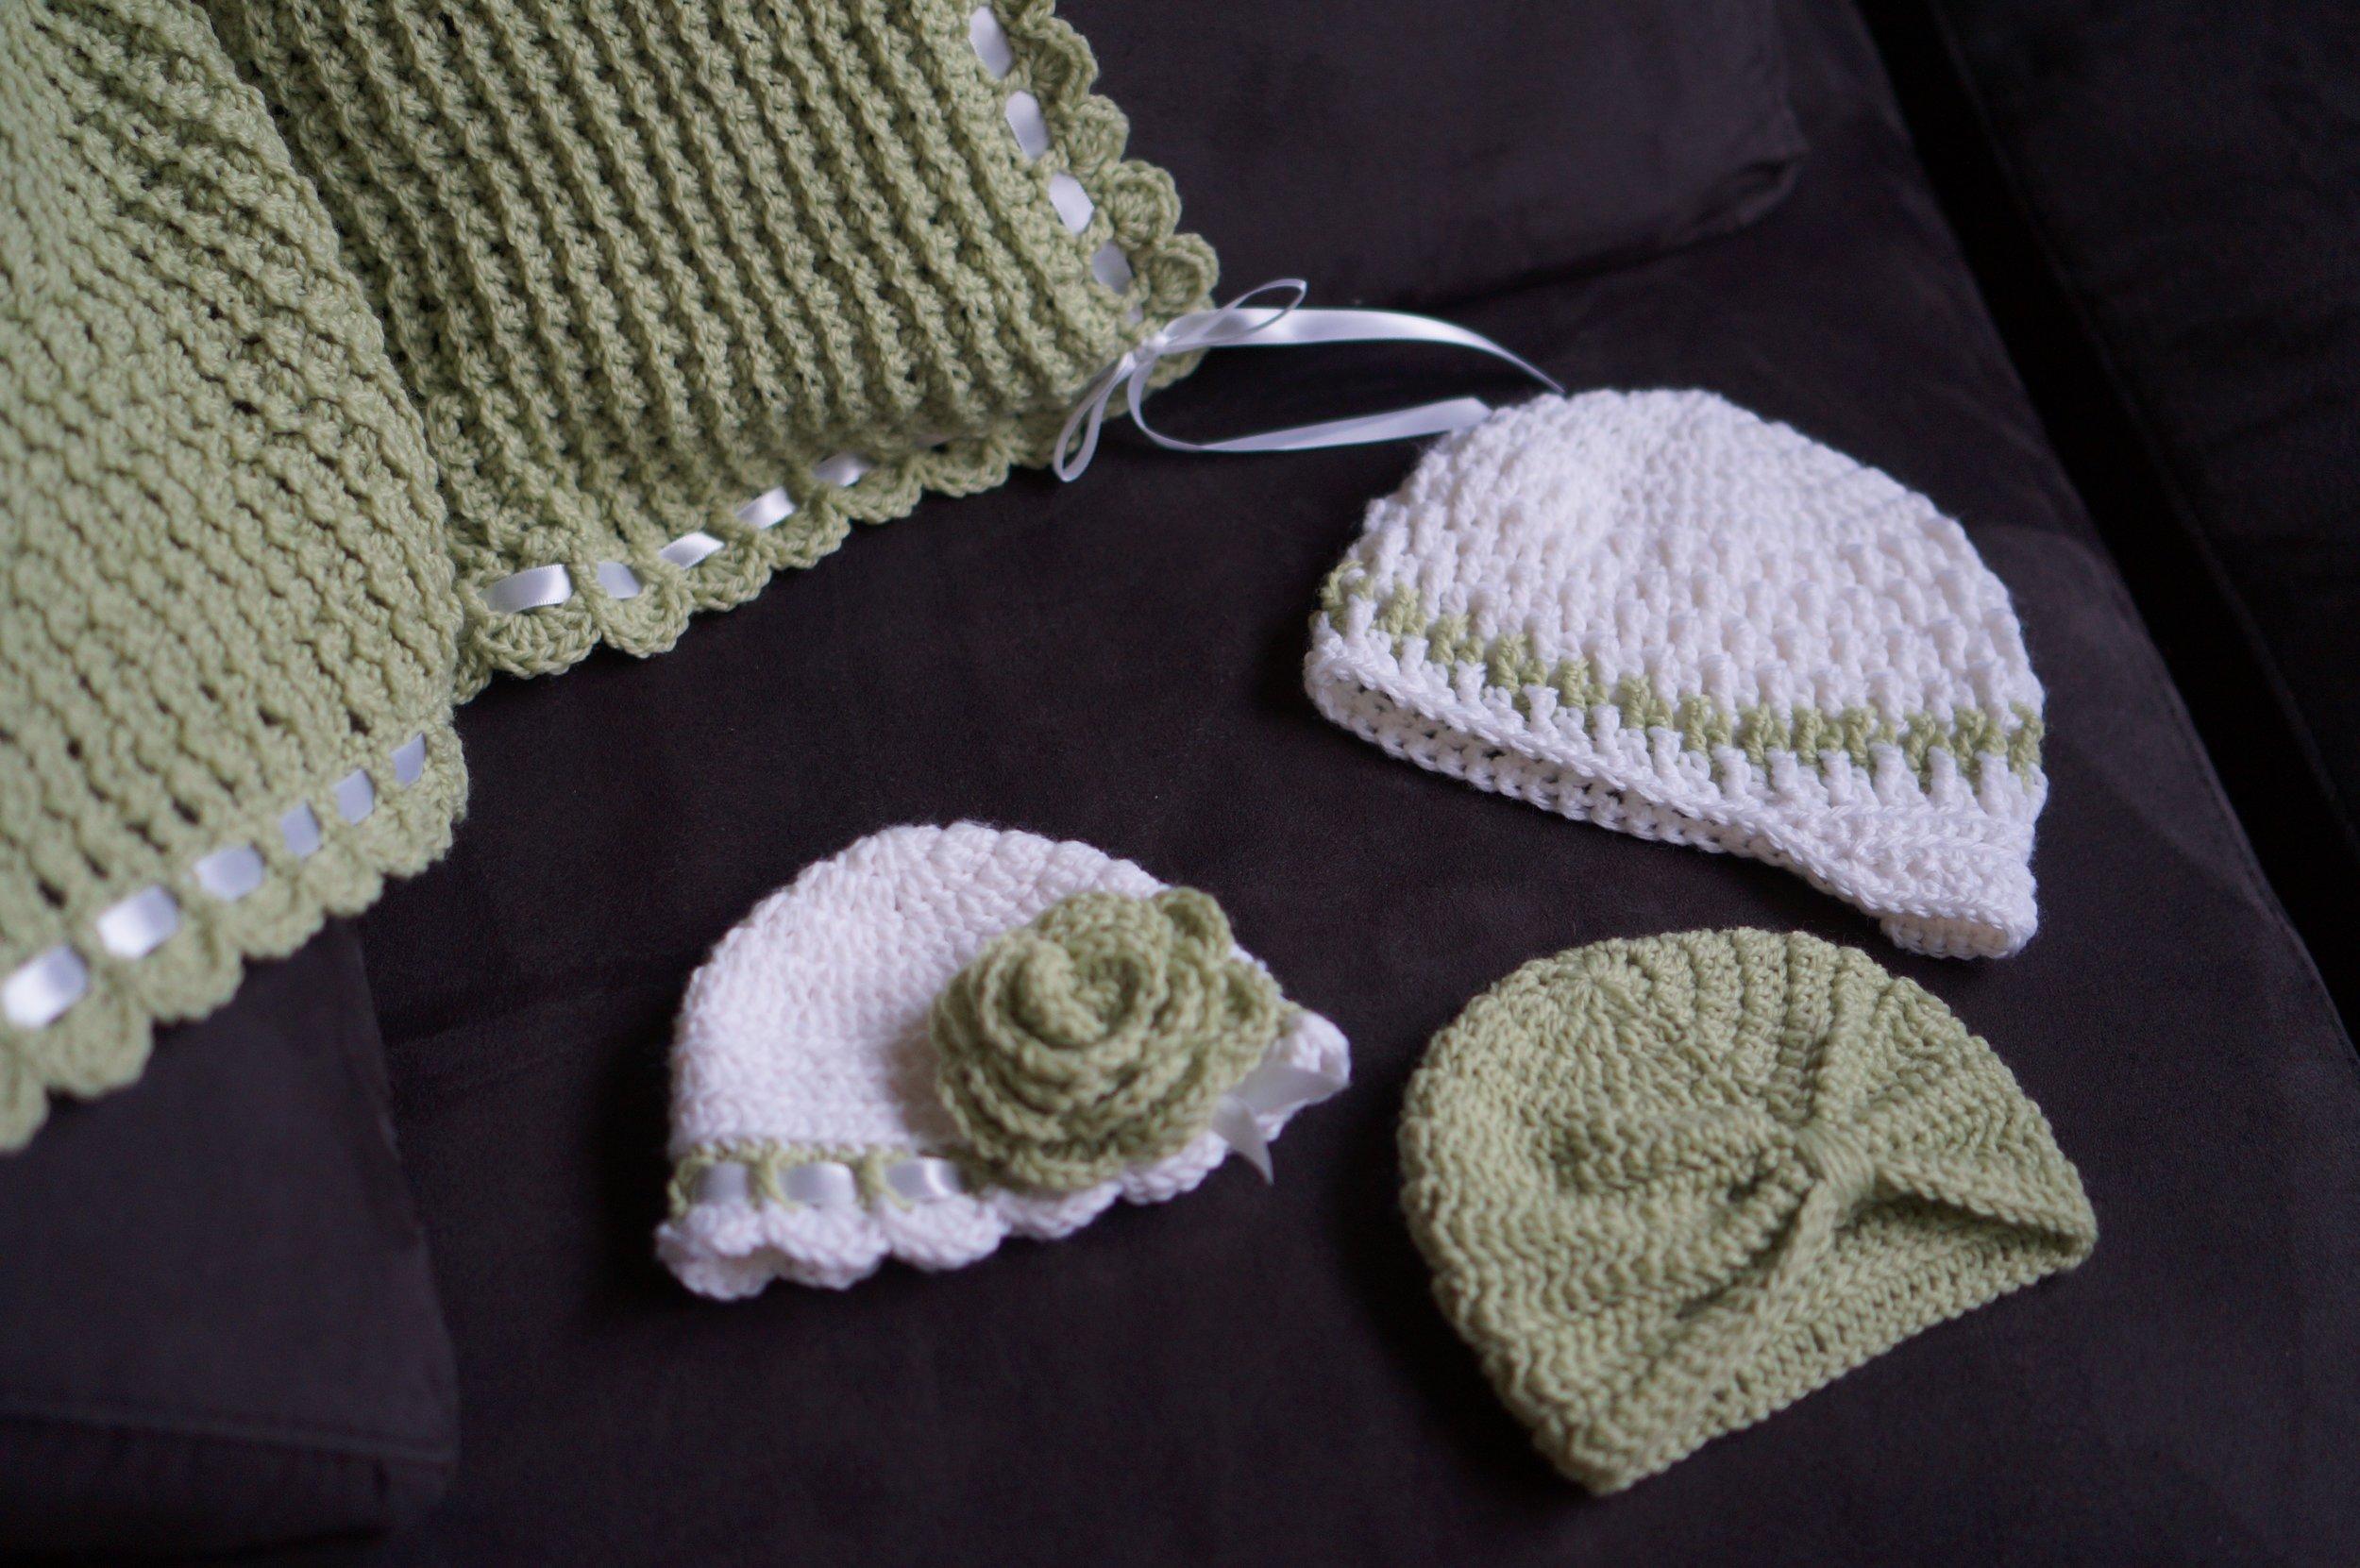 Tiramisu Baby Blanket with coordinating hats.